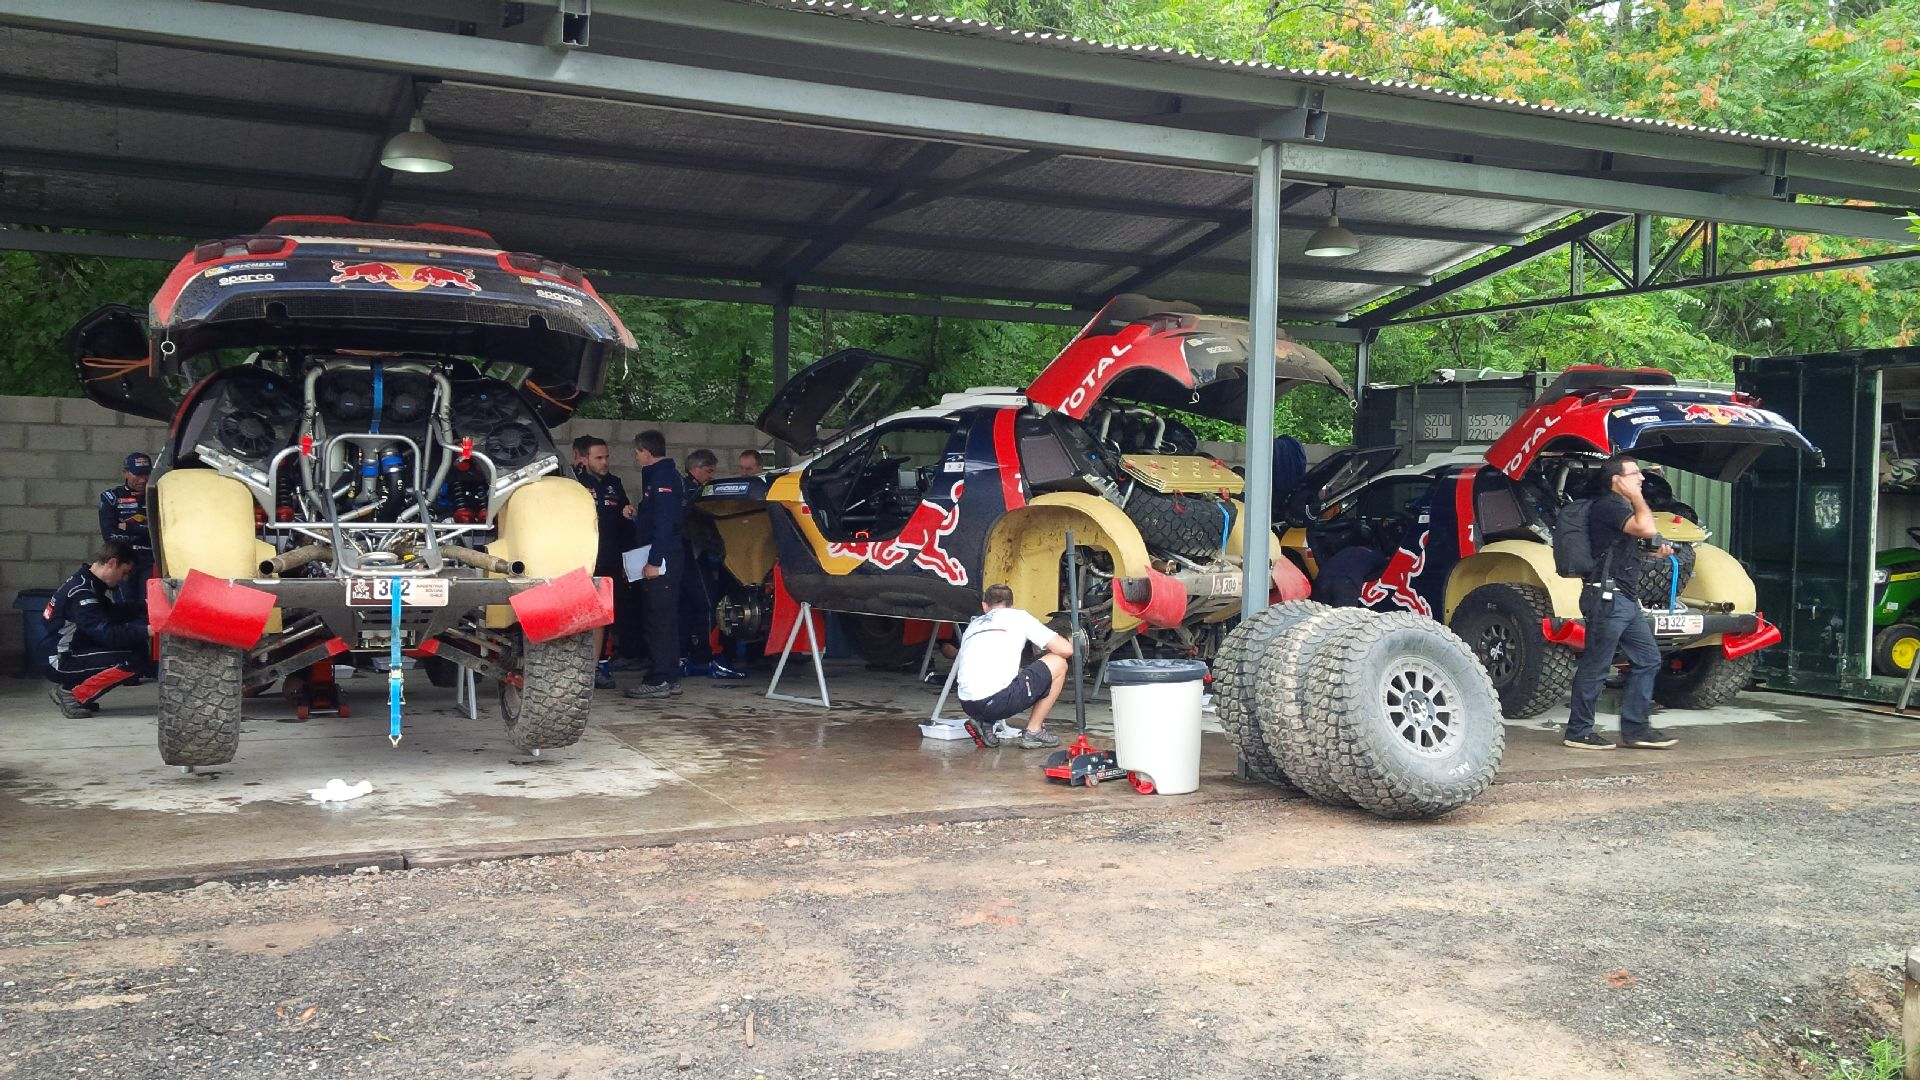 2015 Rallye Raid Dakar Argentina - Bolivia - Chile [4-17 Enero] - Página 5 B6Rc332IcAA2fNc